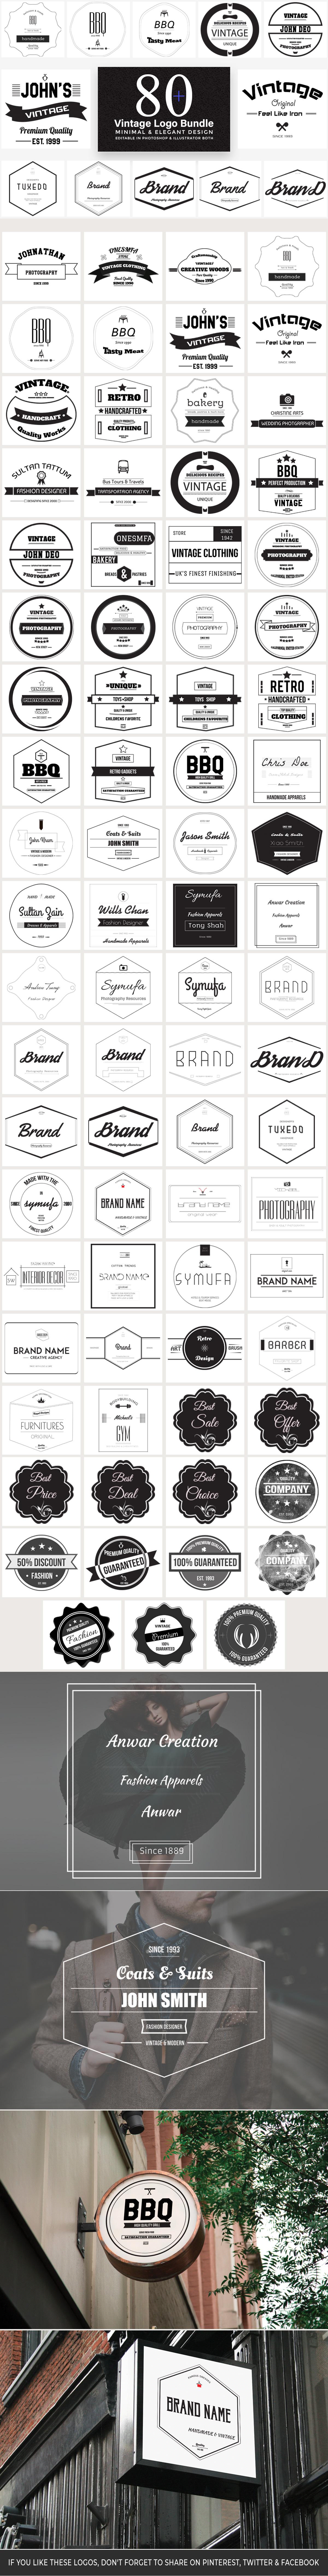 https://nyc3.digitaloceanspaces.com/creativetacos.cdn/2017/04/80-Vintage-Logo-Bundle-Full-Preview.jpg